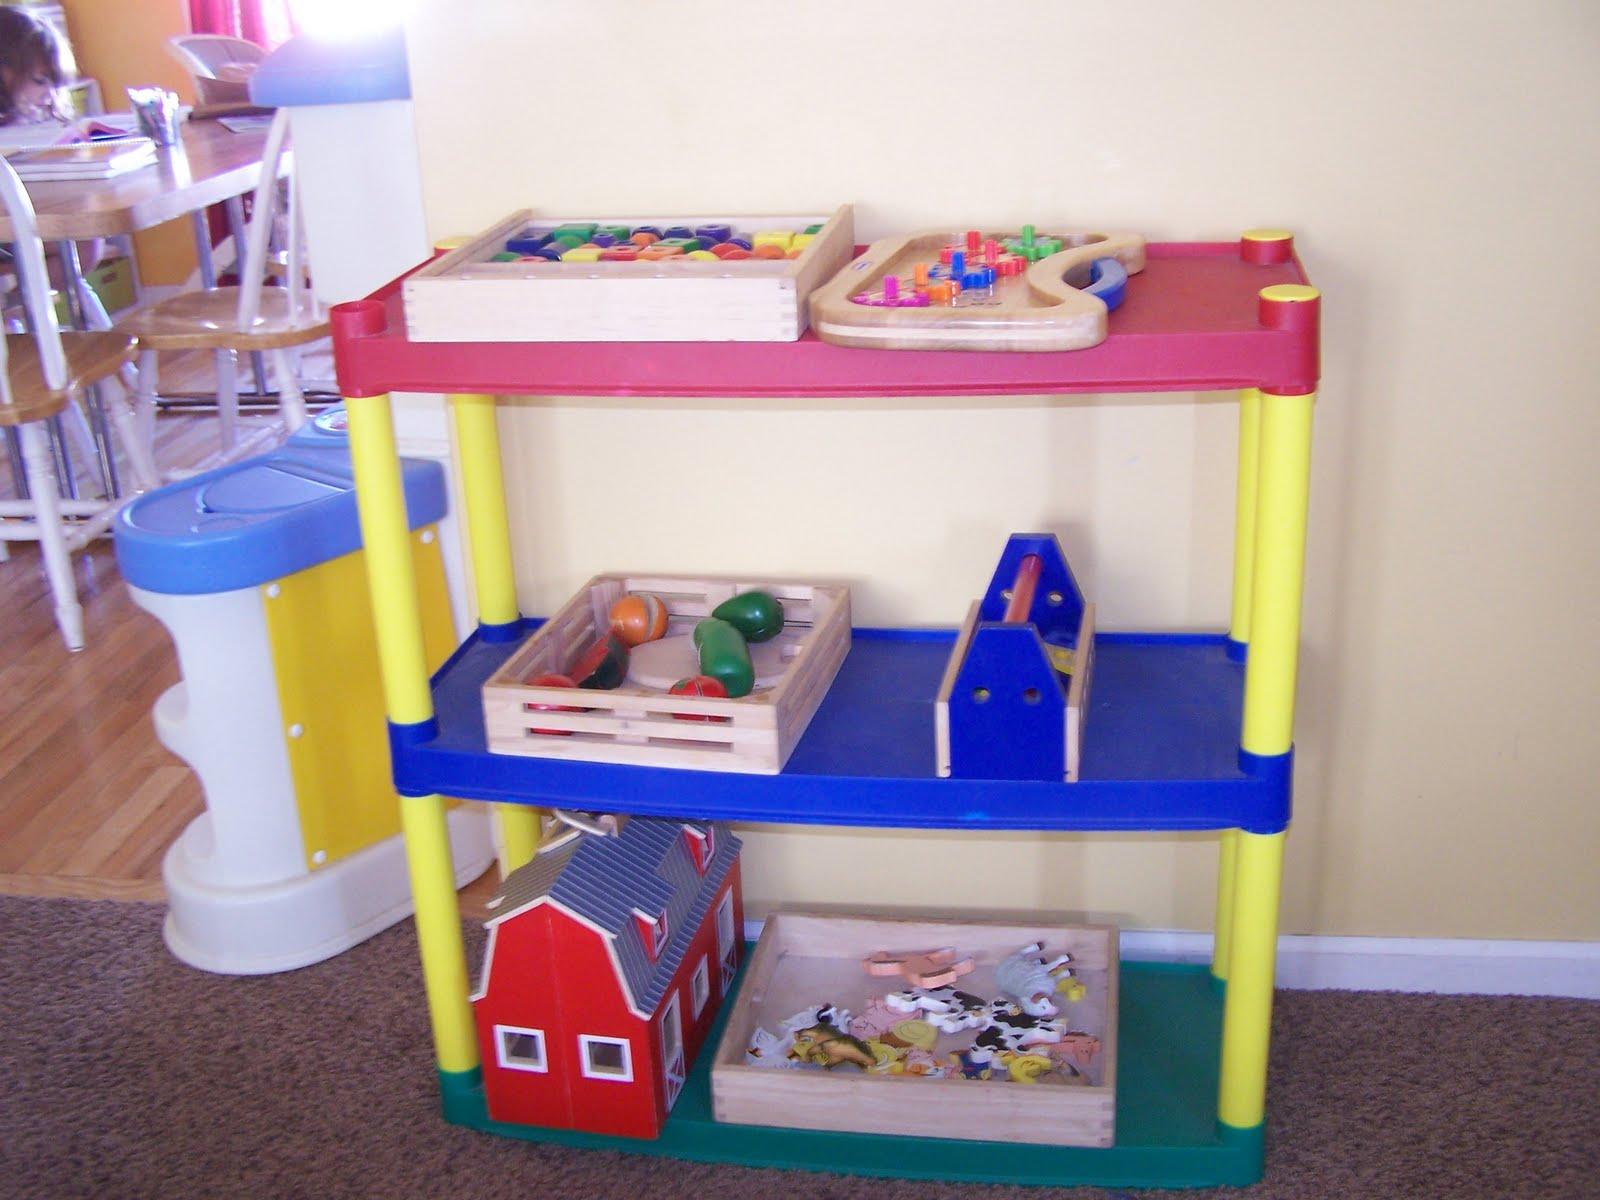 Toys For A Preschool Classroom : Montgomery academy preschool classroom version